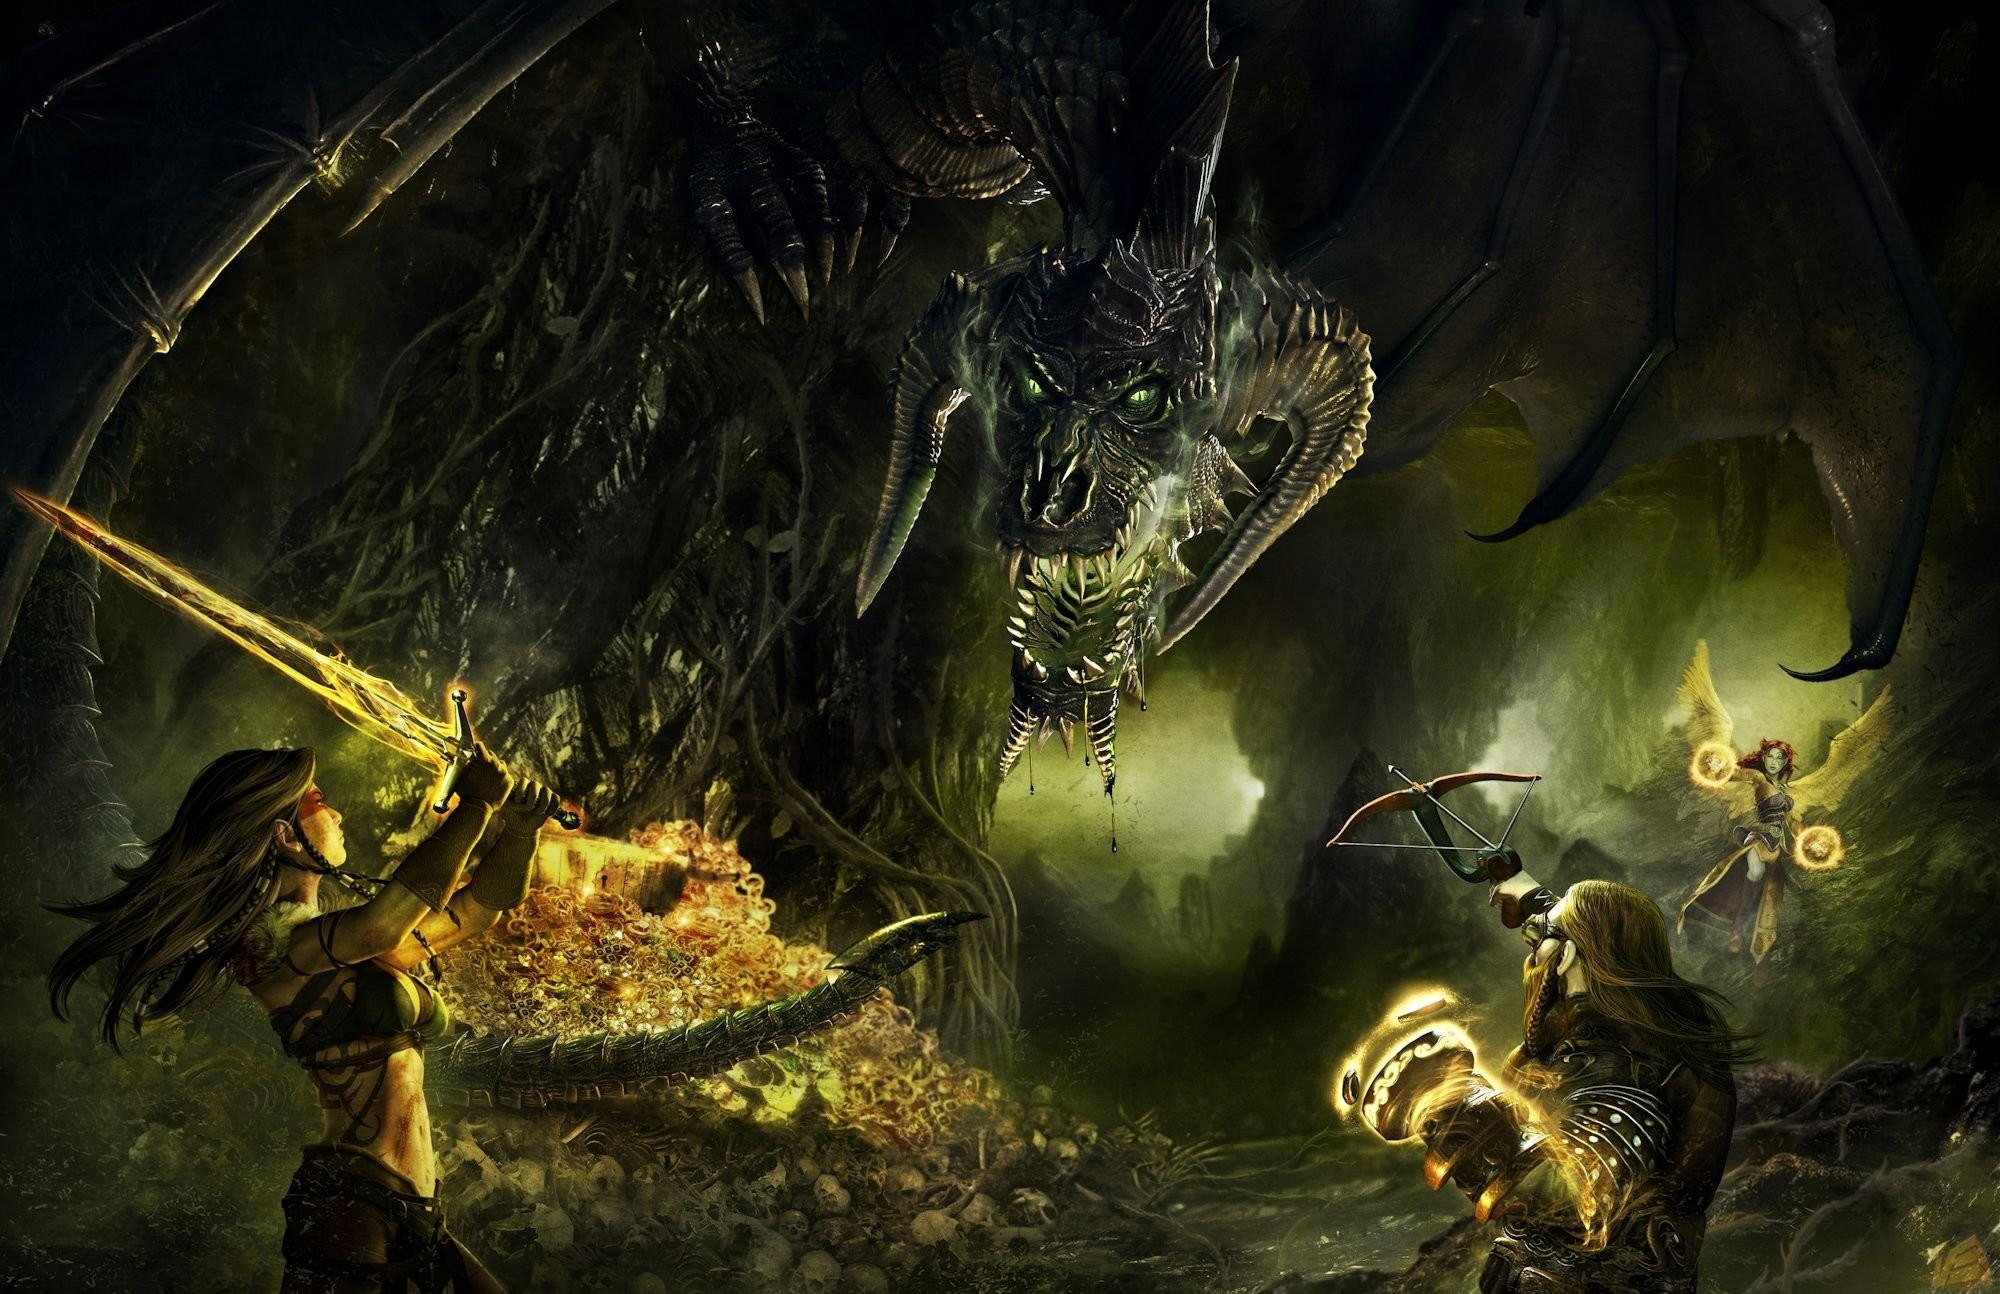 DUNGEONS DRAGONS Forgotten Realms magic rpg action adventure puzzle fantasy  warrior dragon wallpaper | | 821064 | WallpaperUP